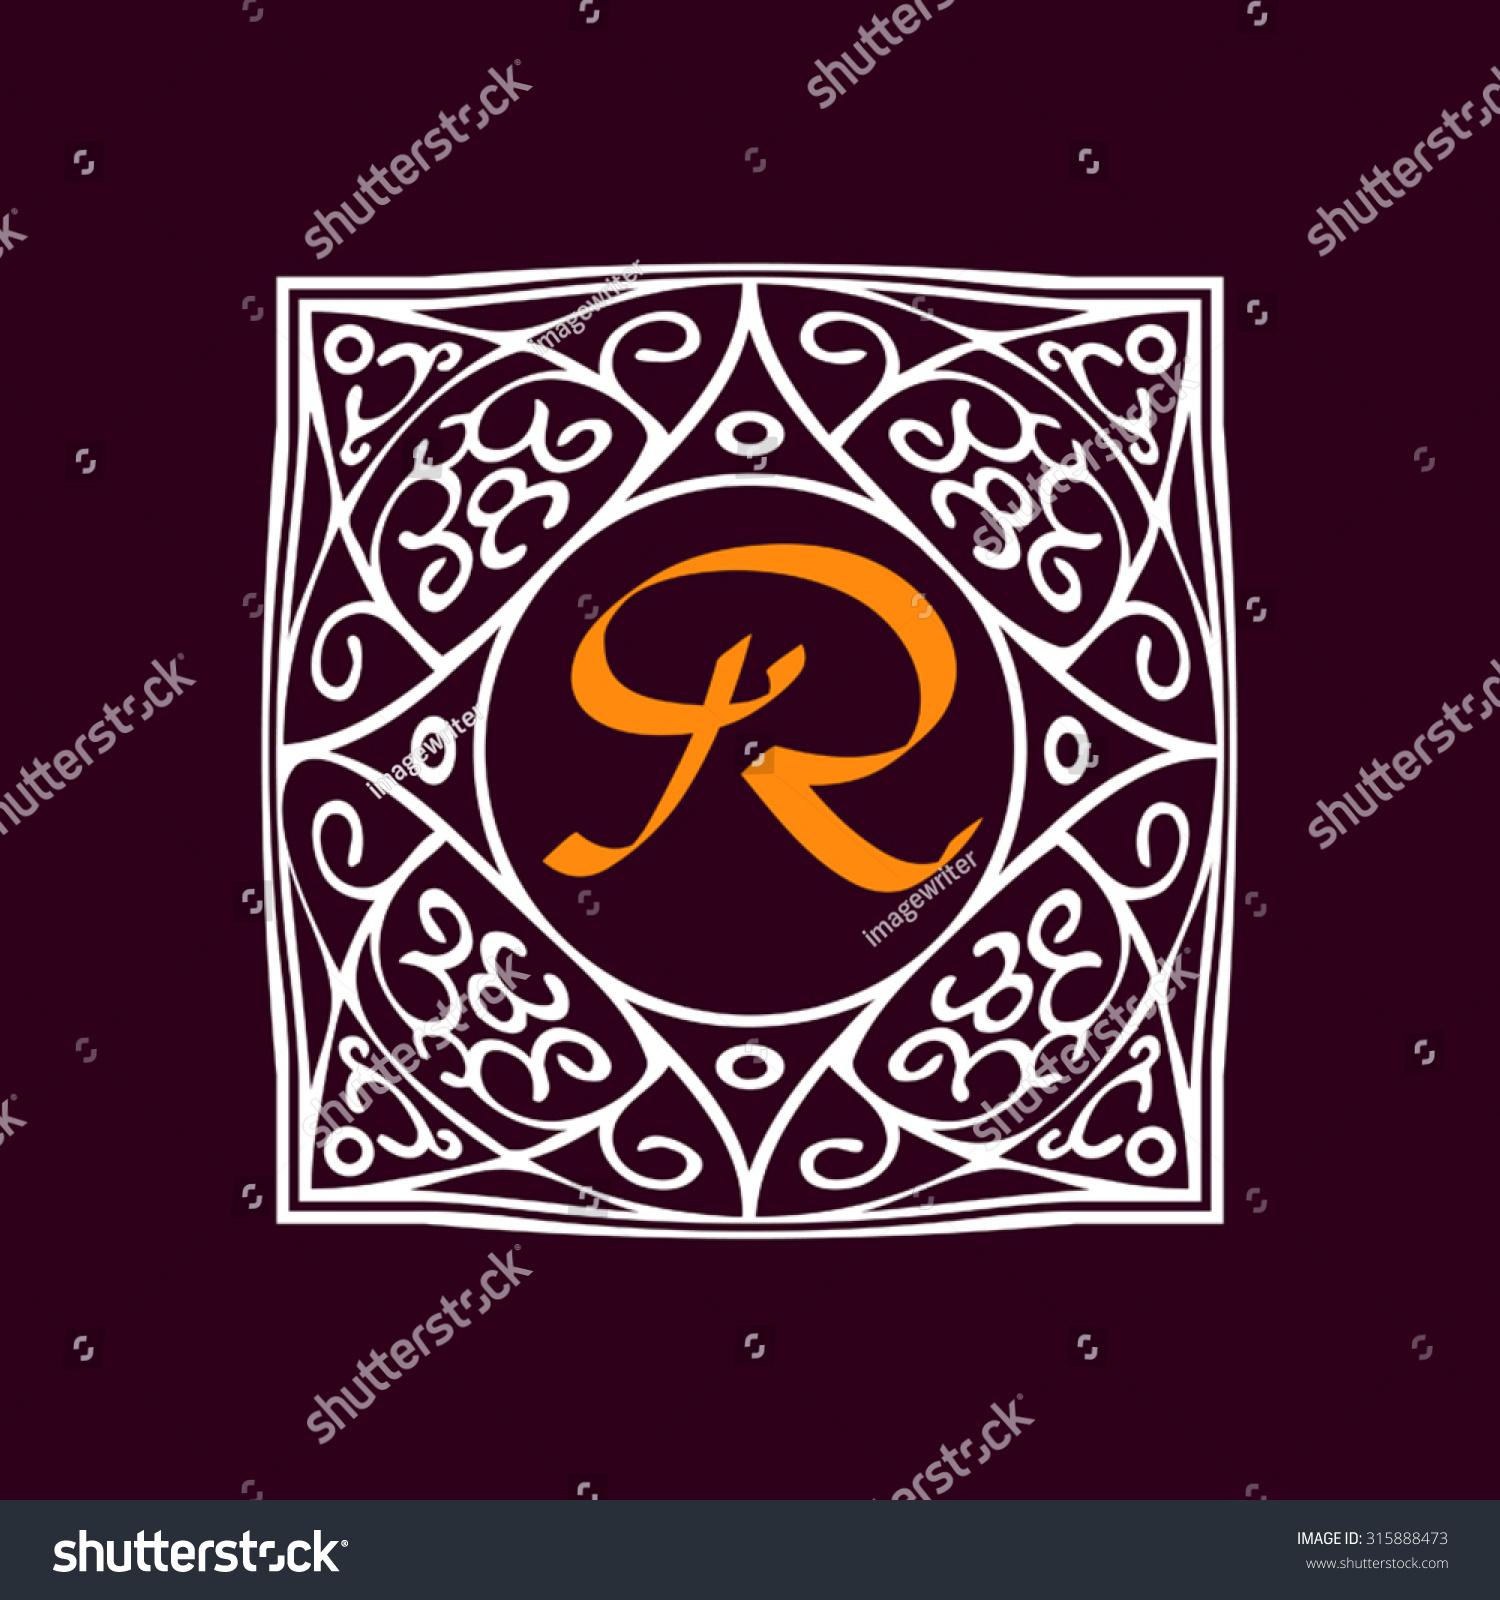 Ornate frame monogram logo other symbol stock vector 315888473 ornate frame for monogram logo or other symbol in arabesque style the r buycottarizona